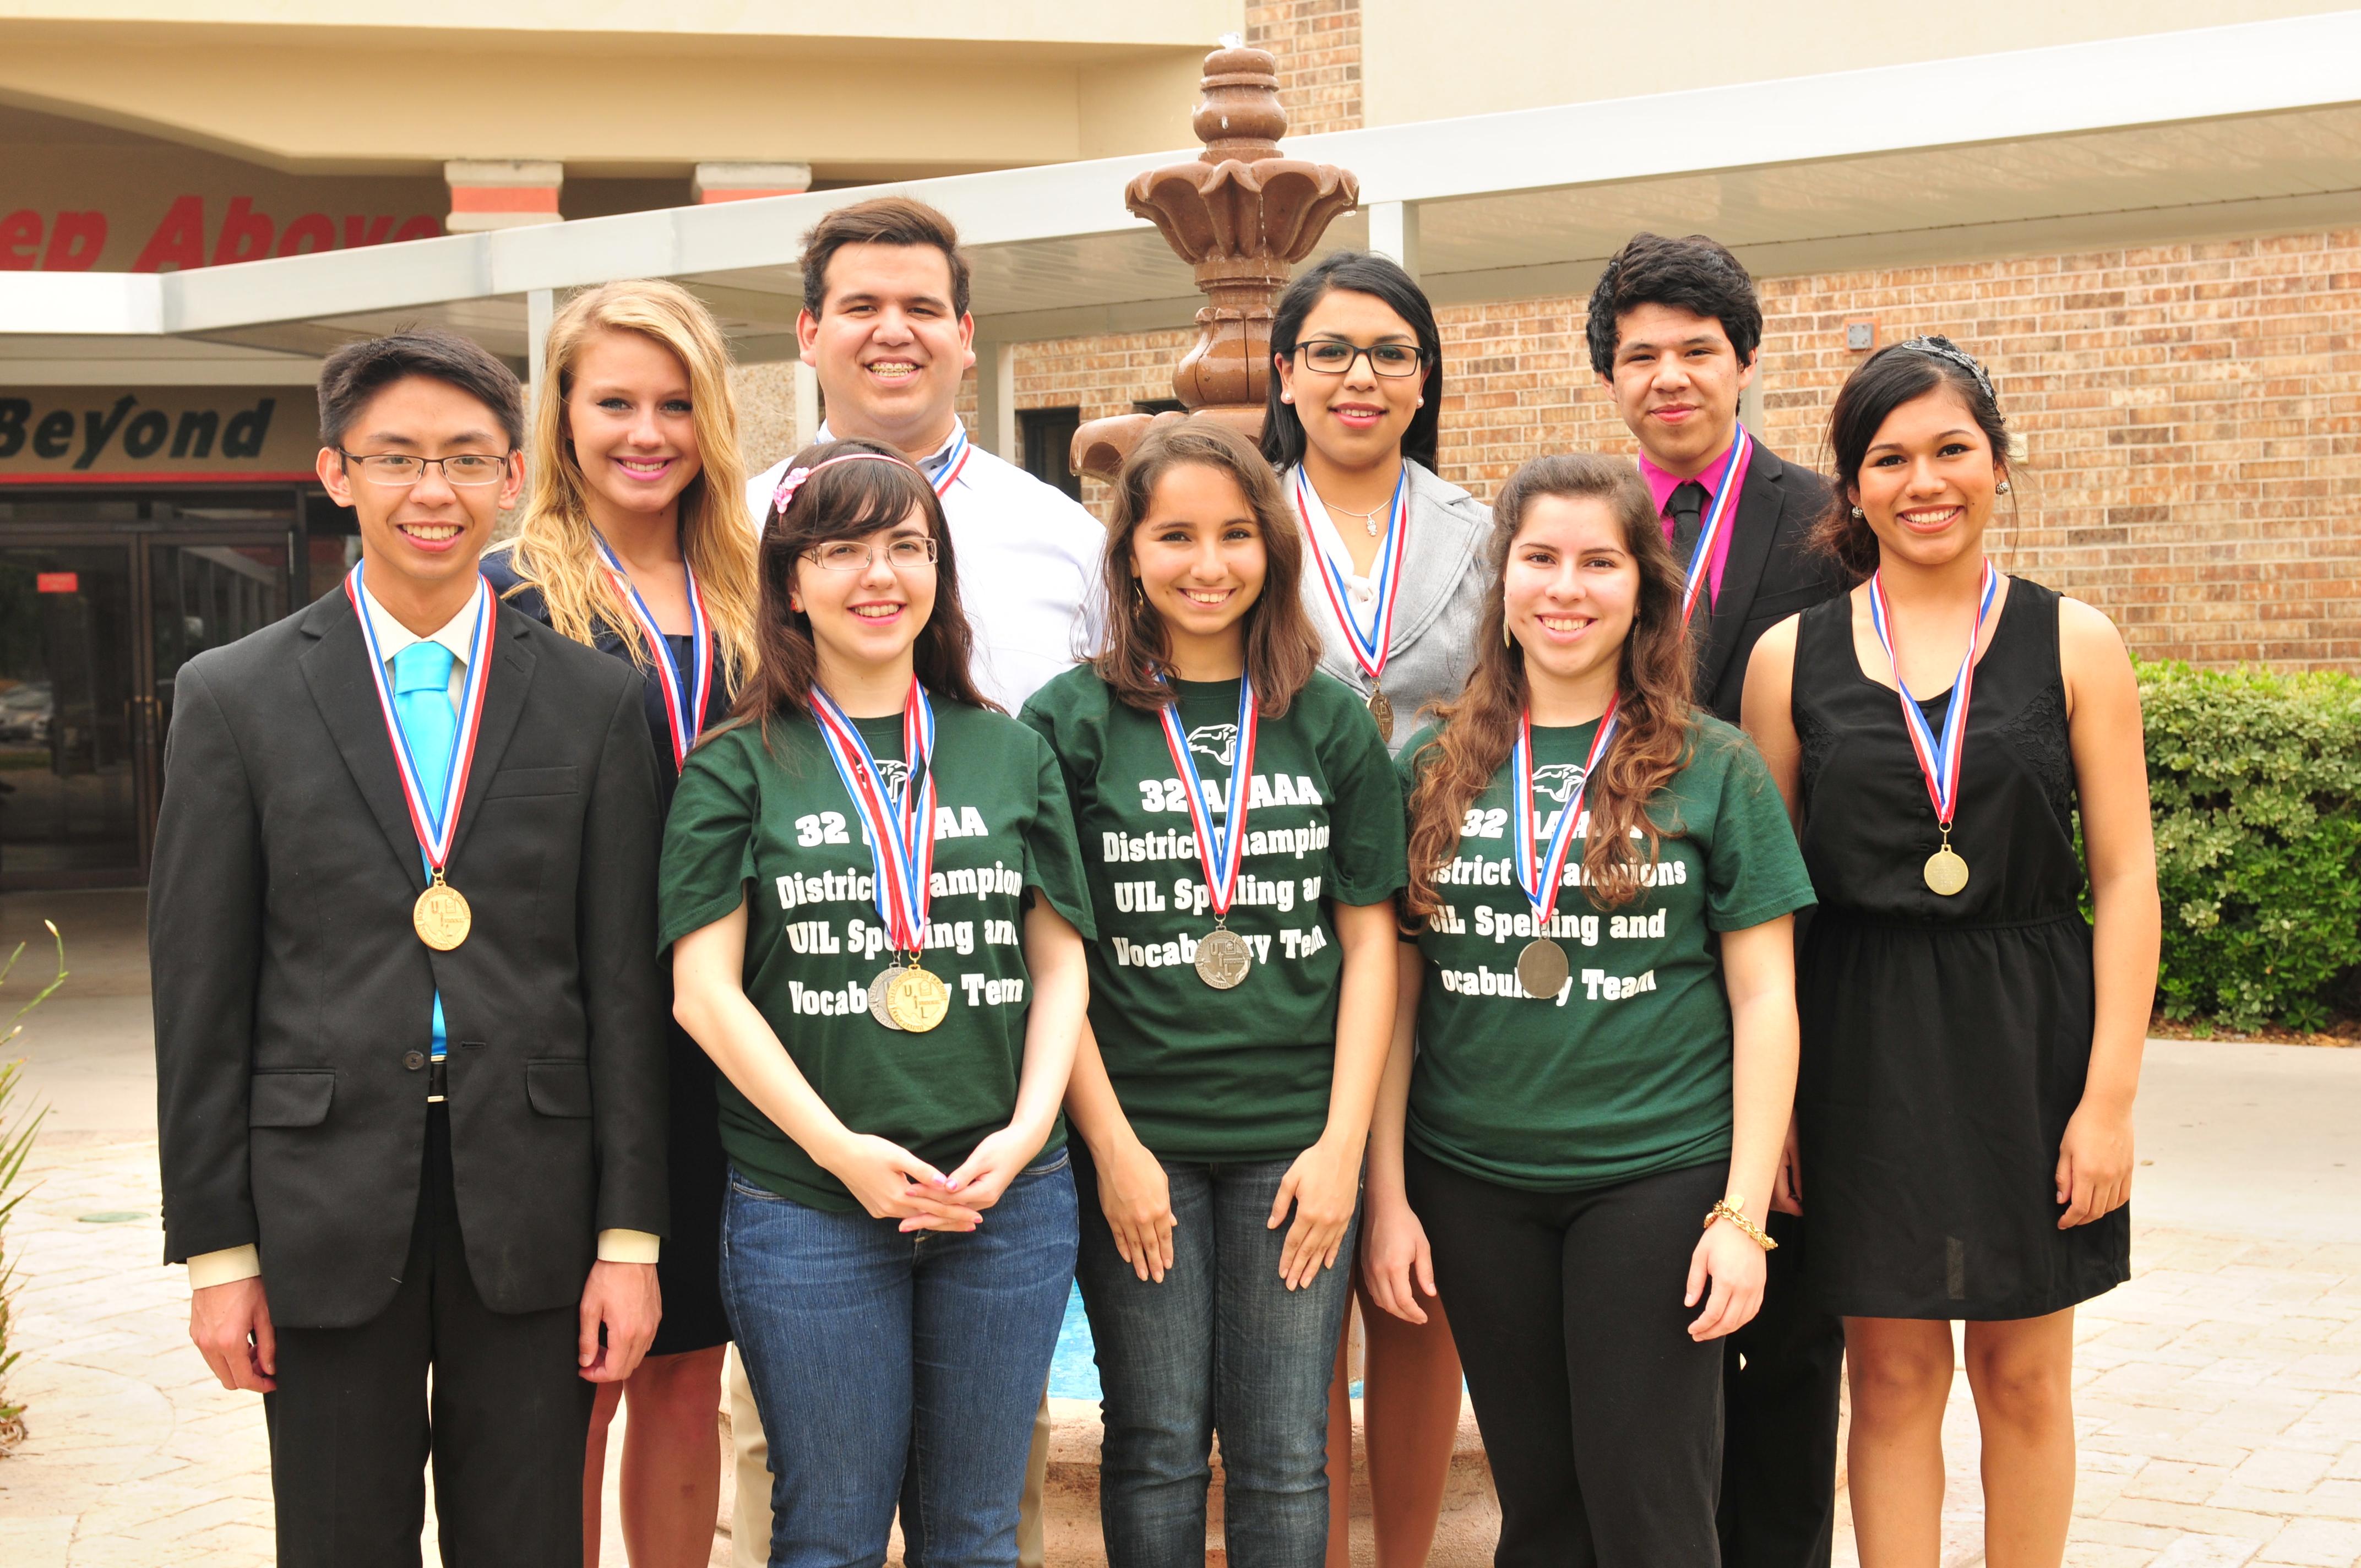 HHSS Academics named Region Champion at tournament